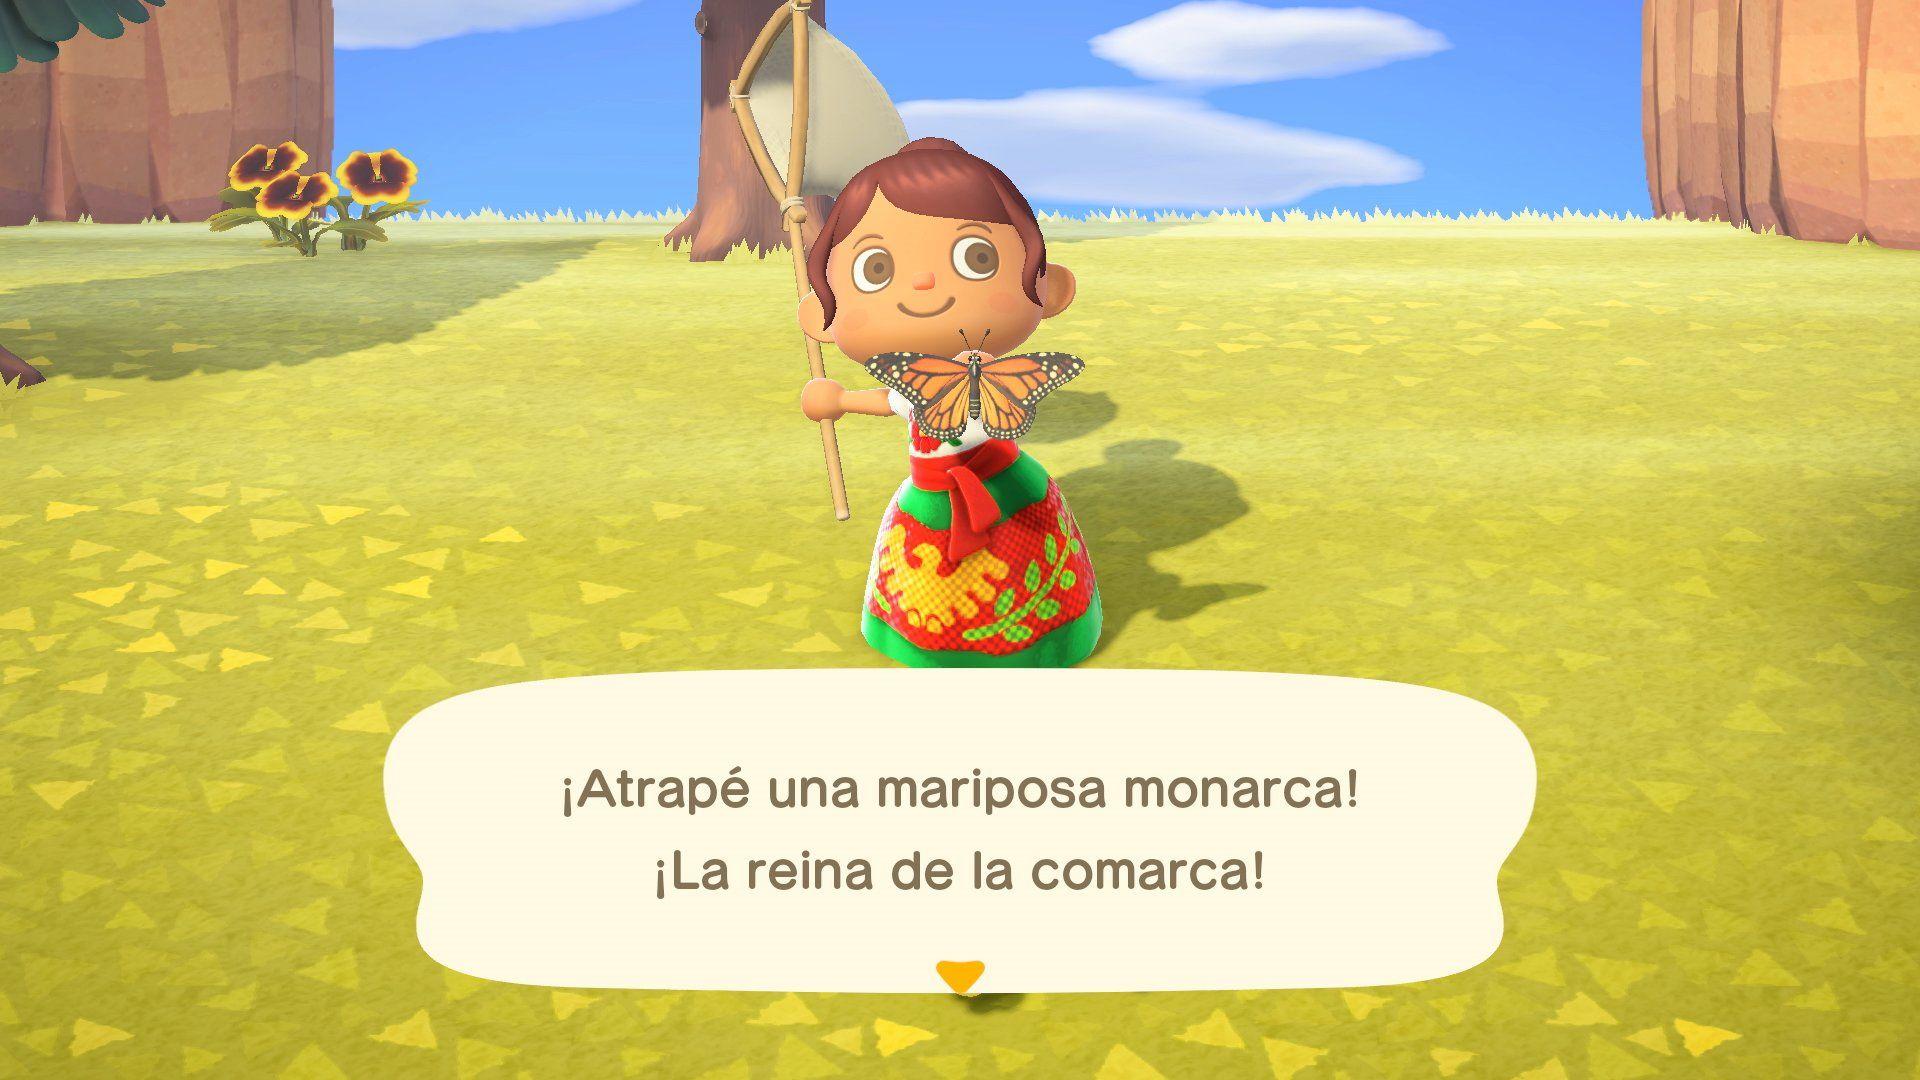 Animal Crossing New Horizons Vendra En Espanol Latino Https Degeneracionx Com 2019 12 Animal Crossing New Horizo Animales Juegos De Animales Animal Crossing